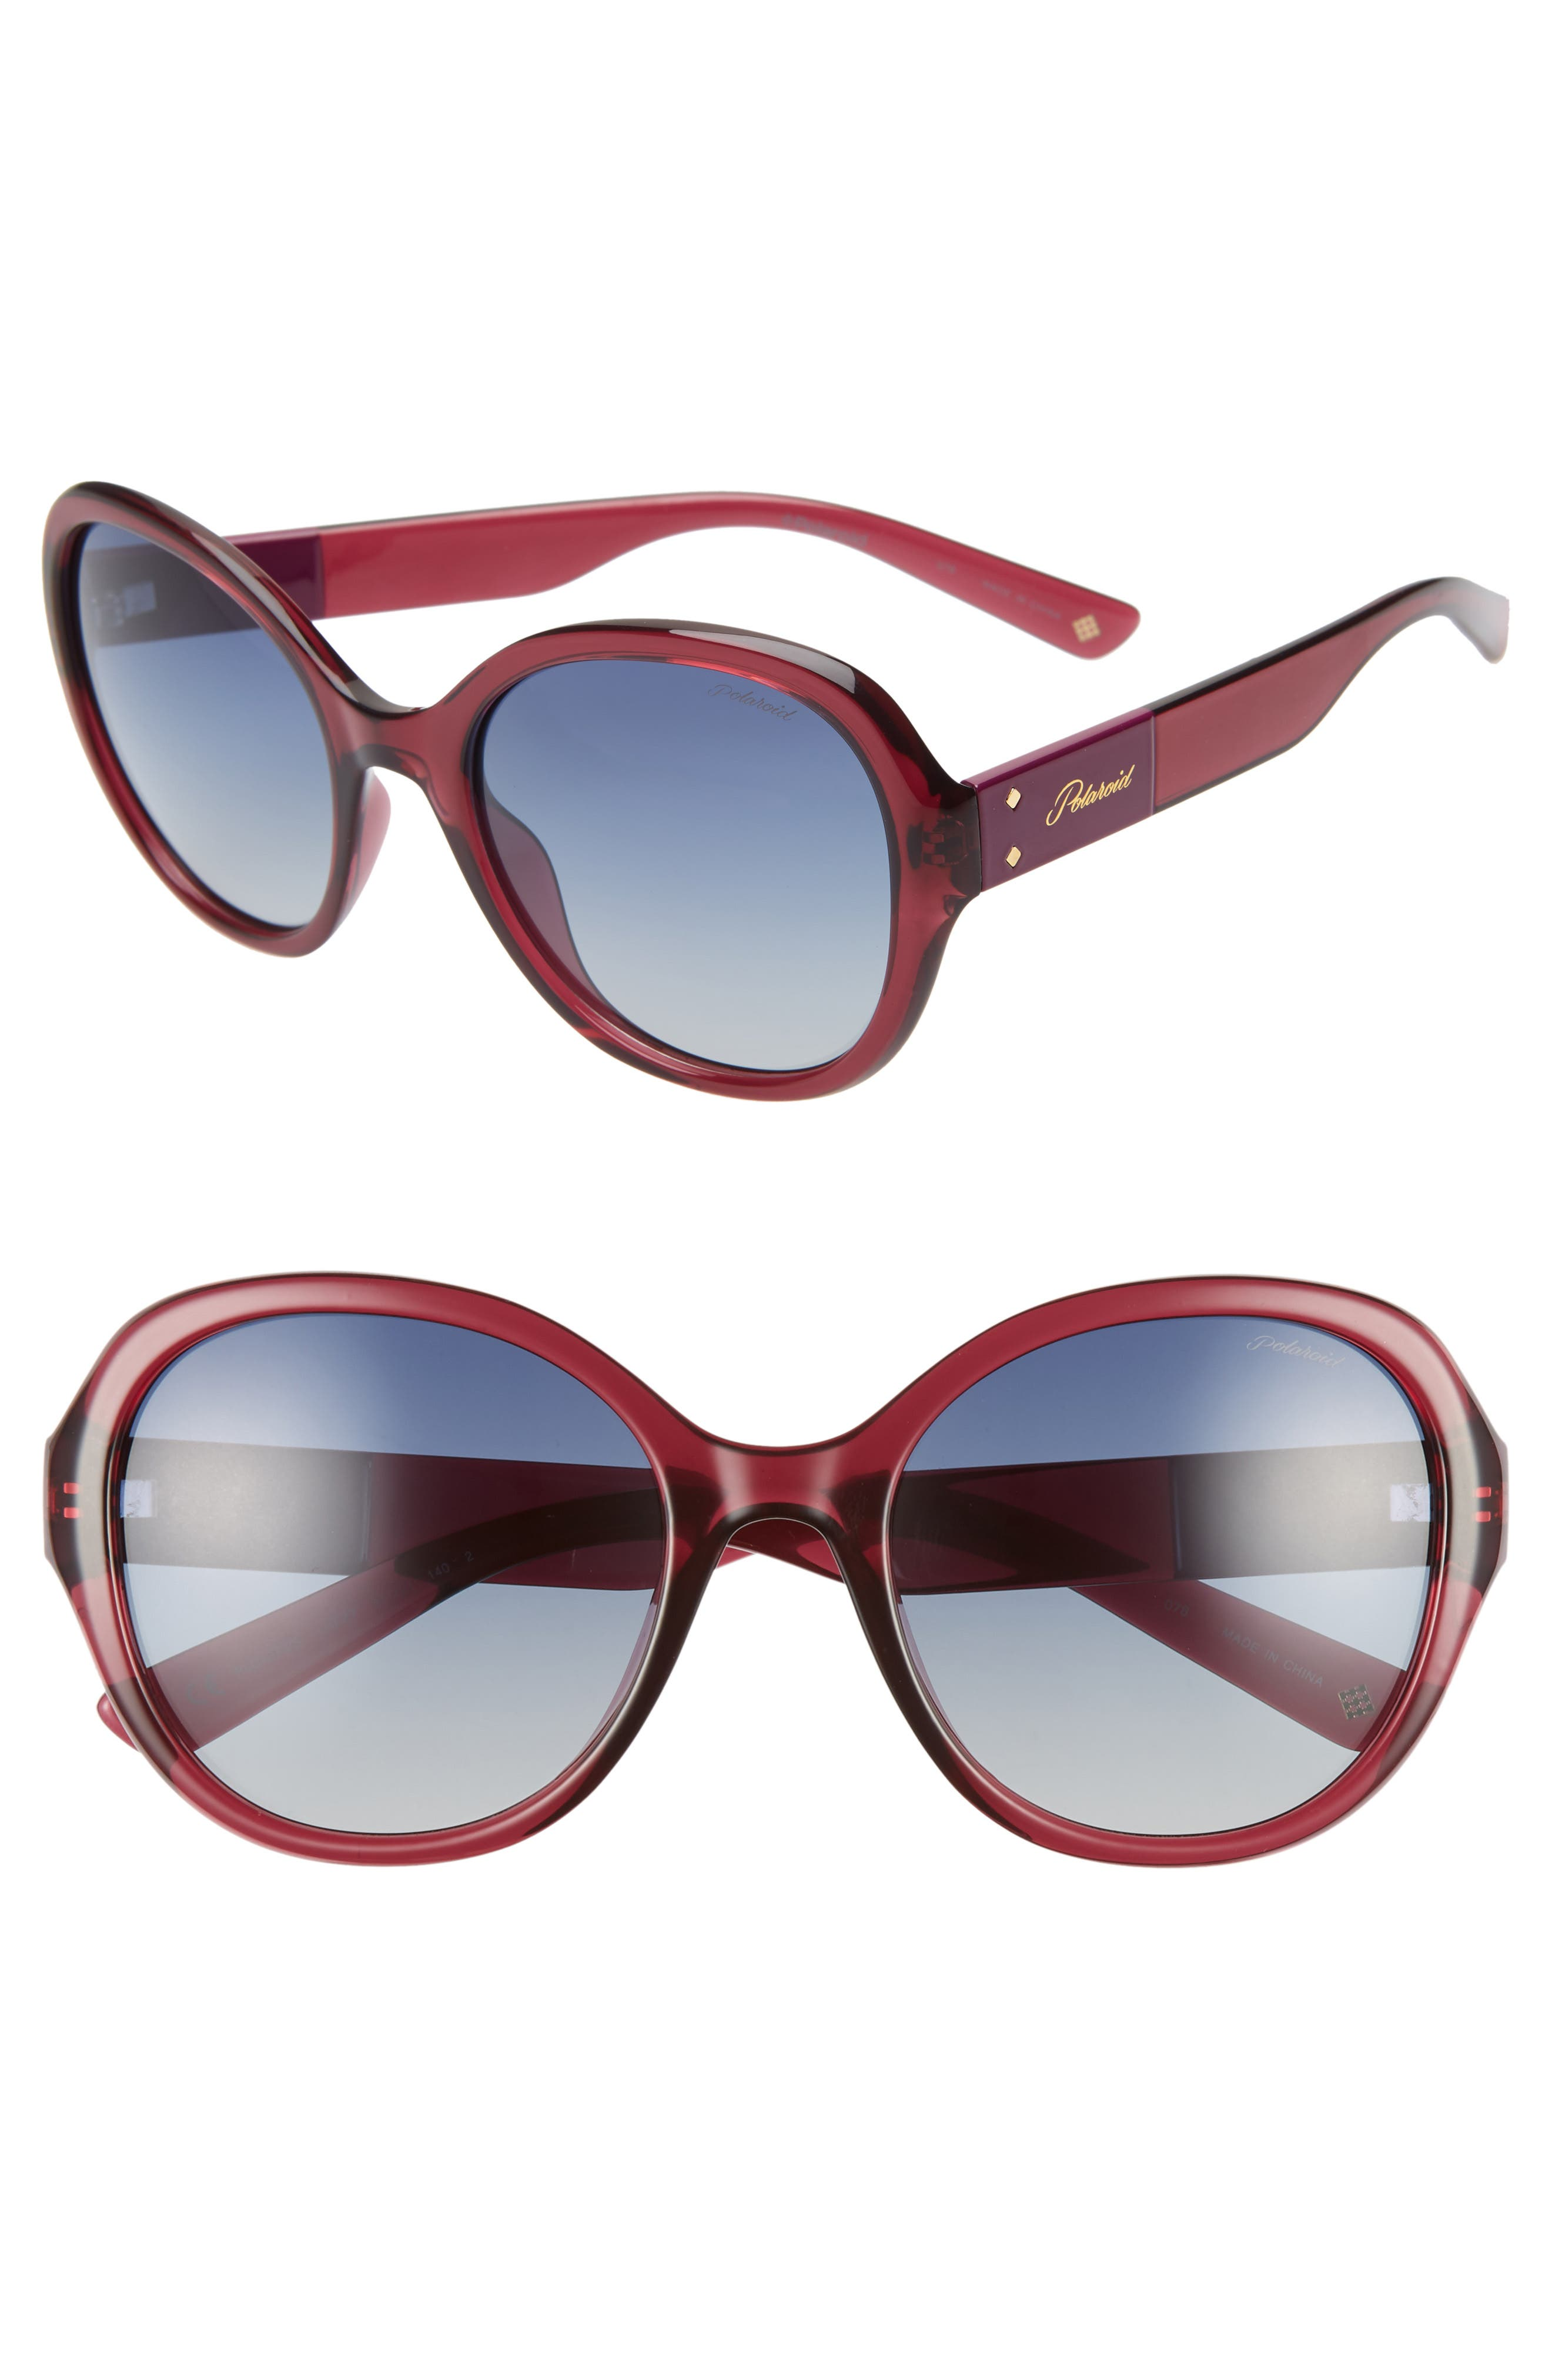 Polaroid 55Mm Polarized Round Sunglasses - Ople Burgundy